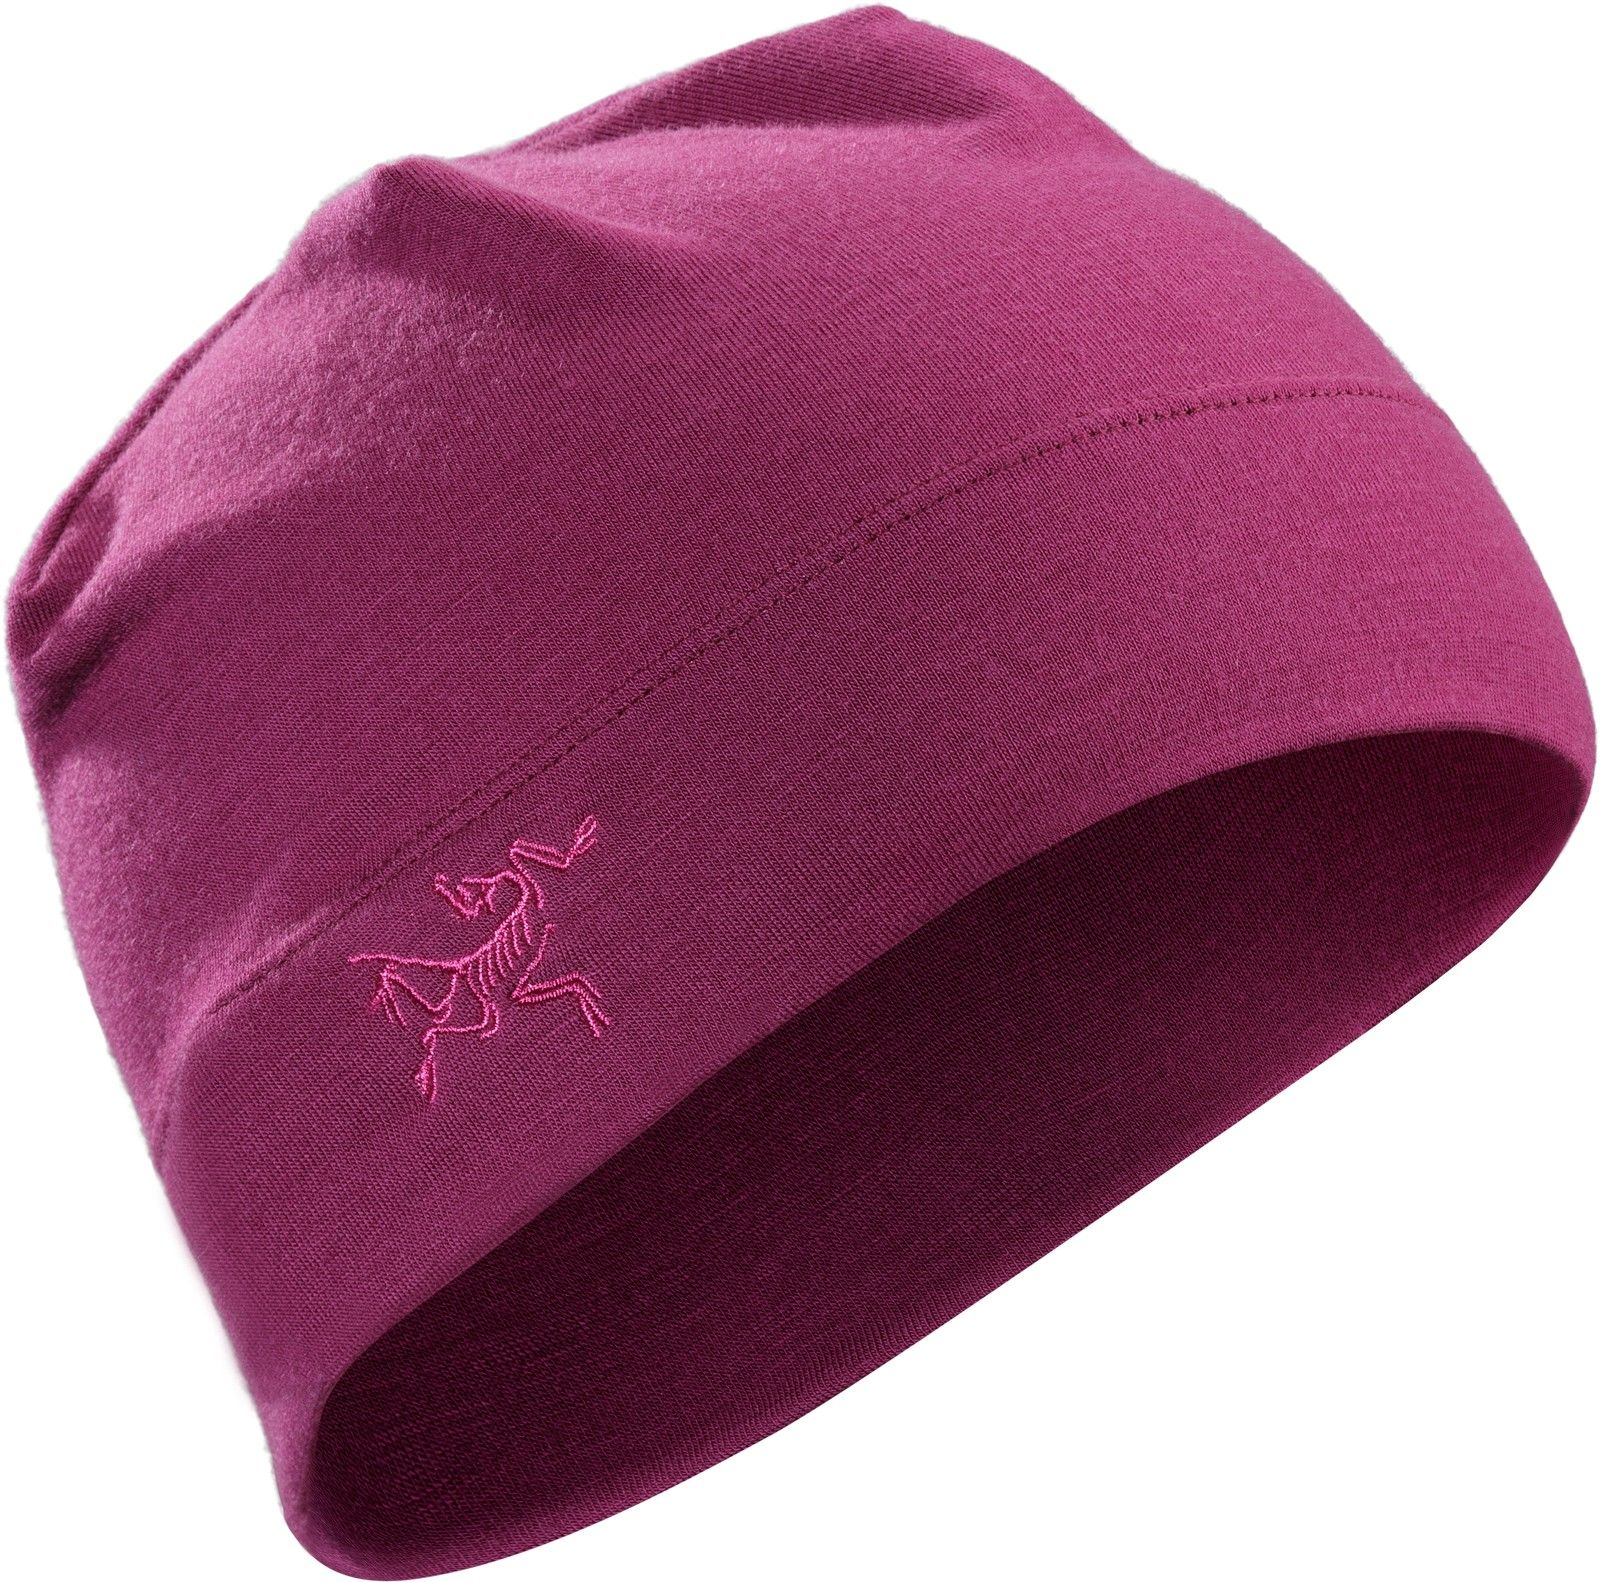 Arcteryx RHO LTW Beanie Pink, Merino Accessoires, One Size